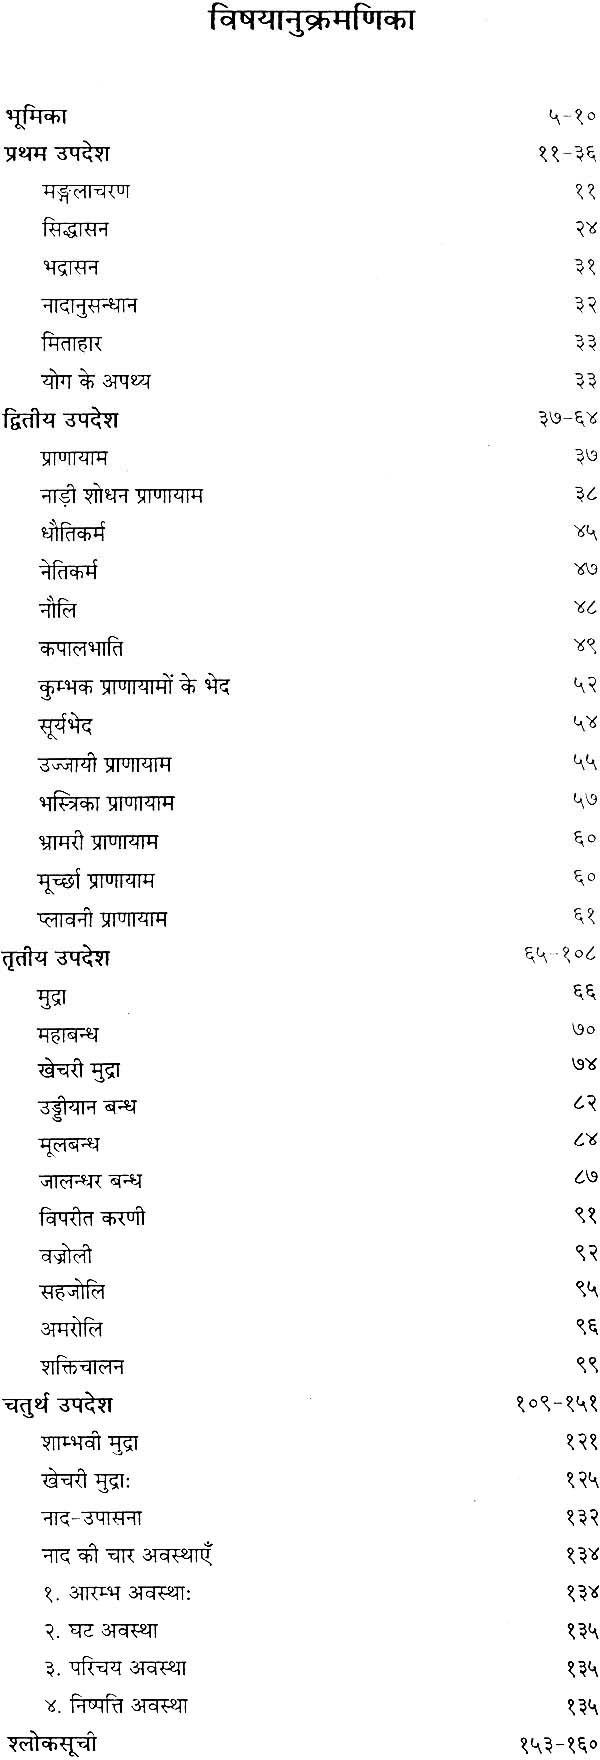 flirt meaning in hindi translation free